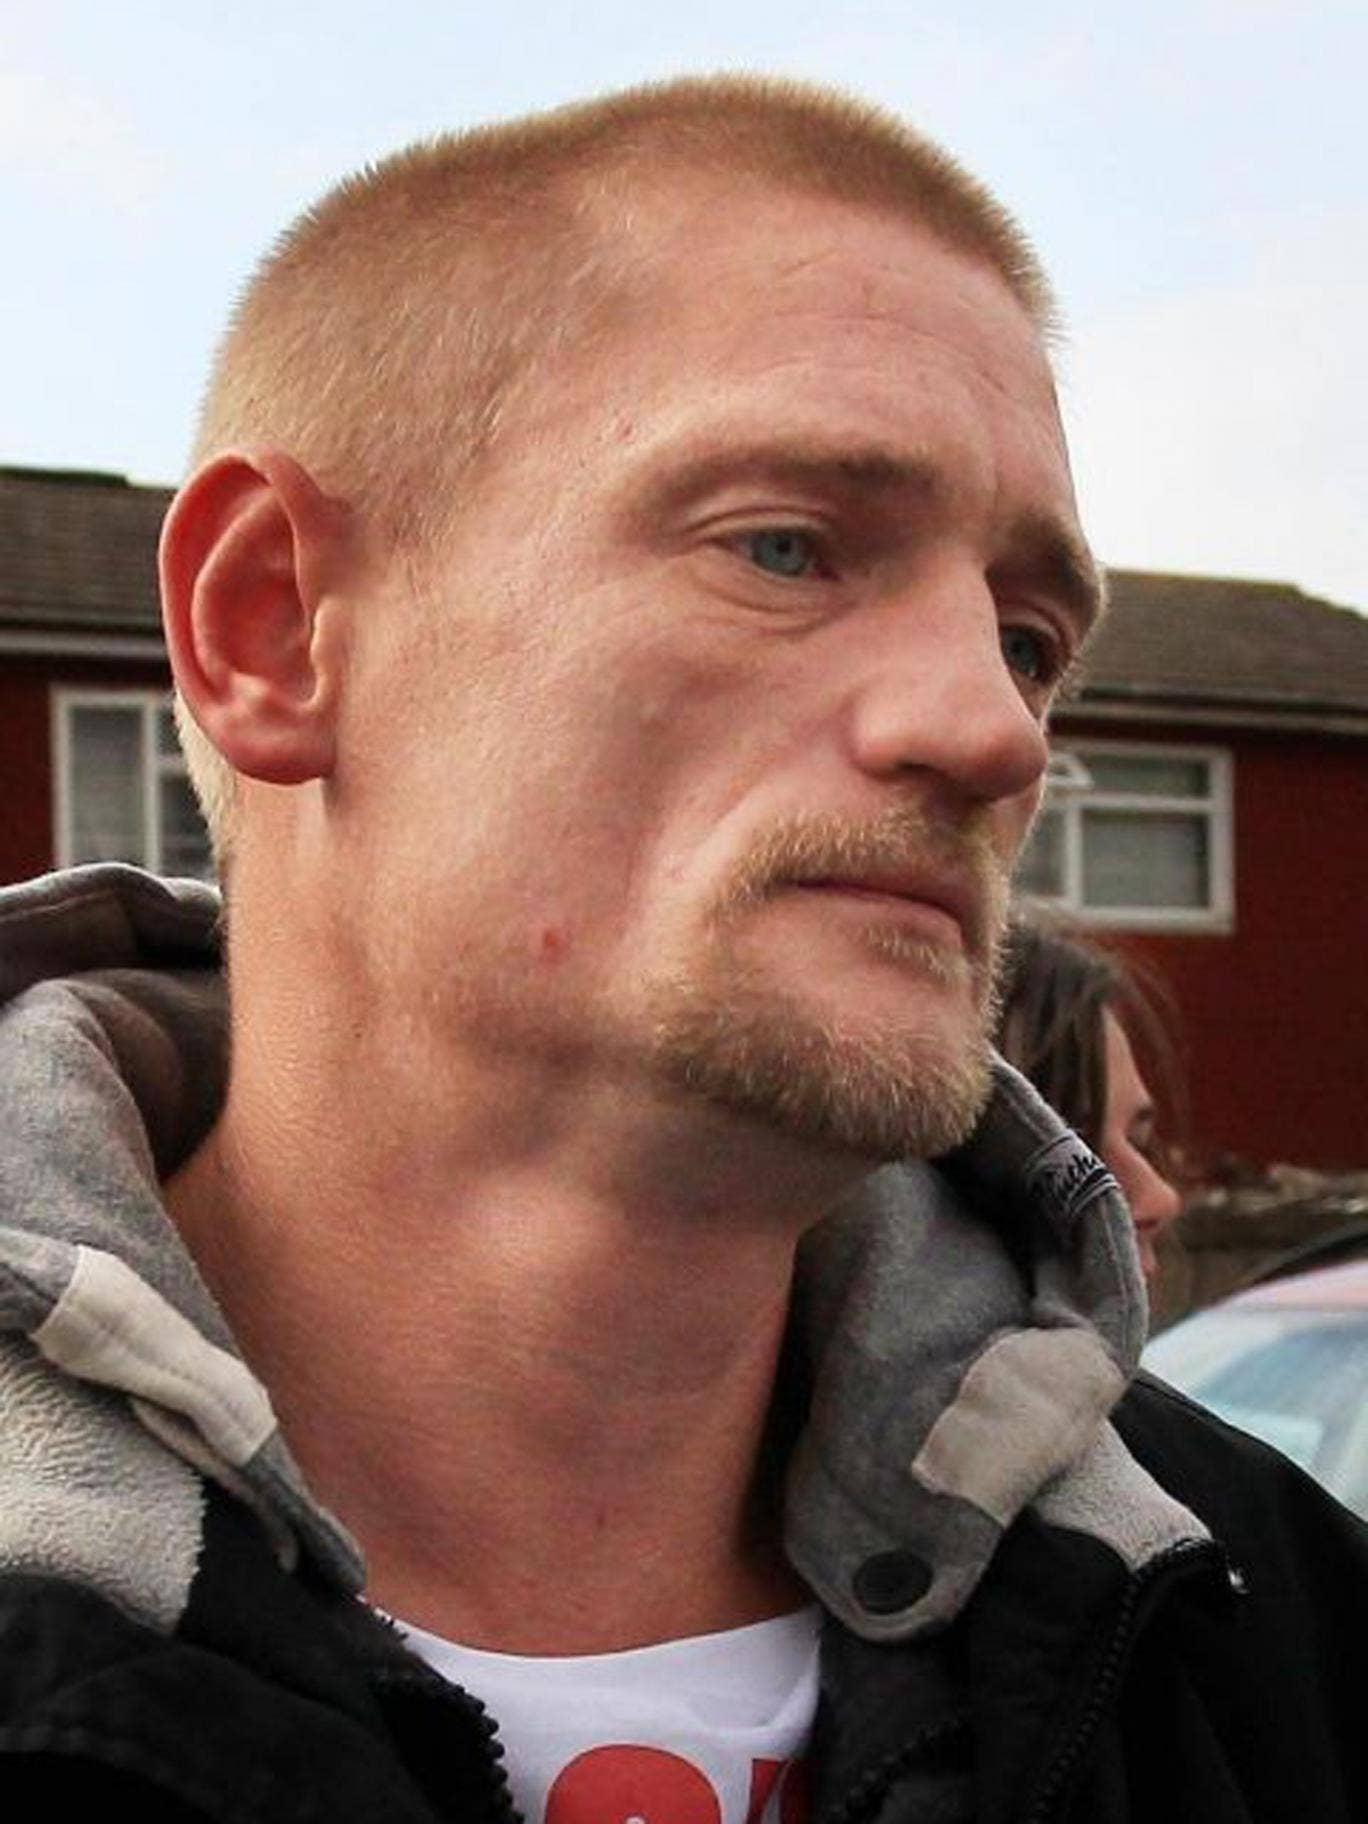 Stuart Hazell before his arrest in August last year